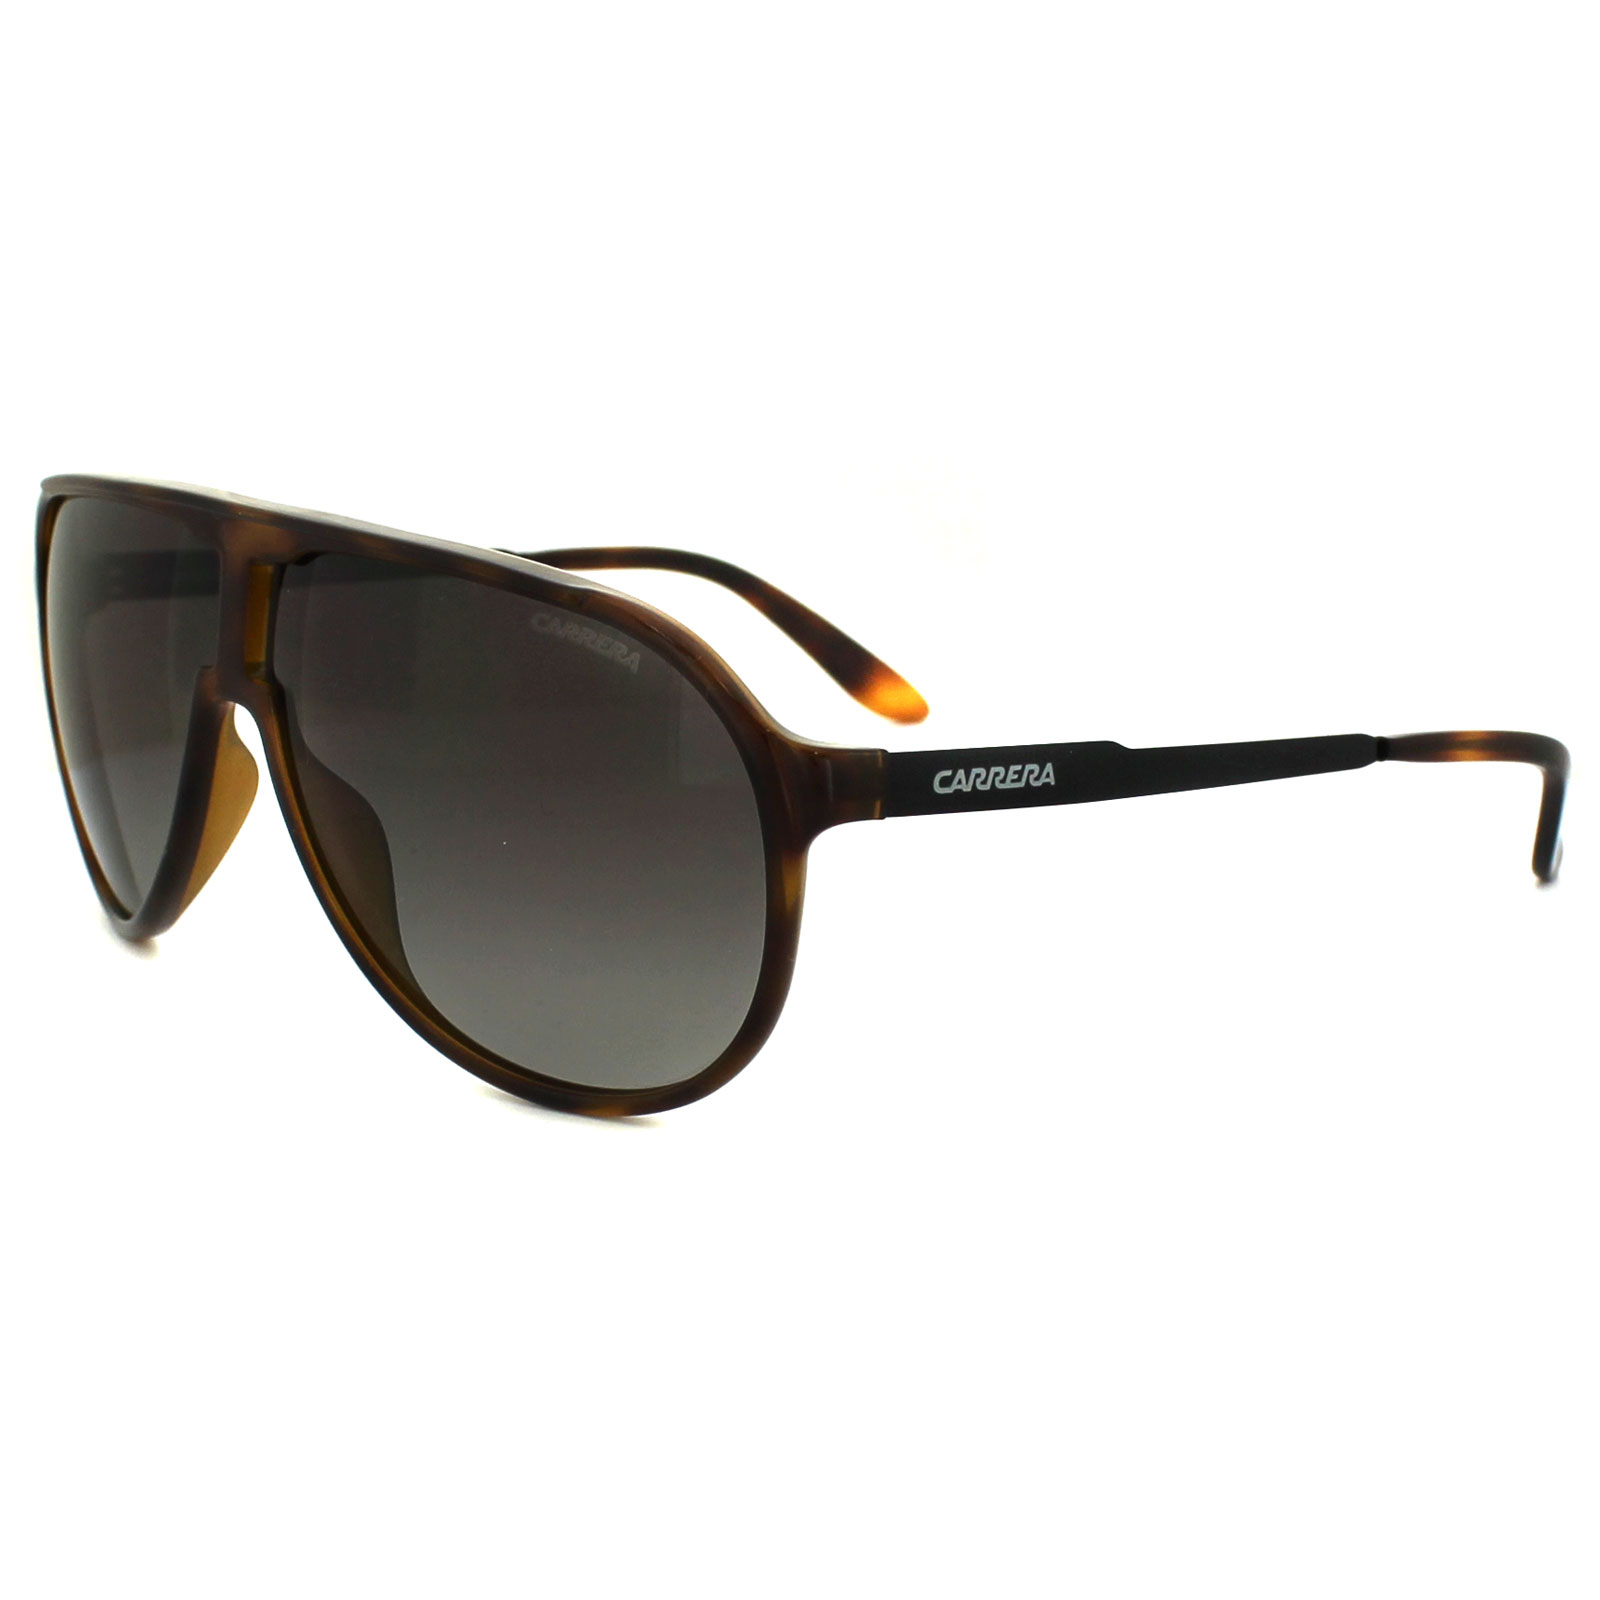 5e337efa6737 Carrera Aviator Sunglasses Yellow Black